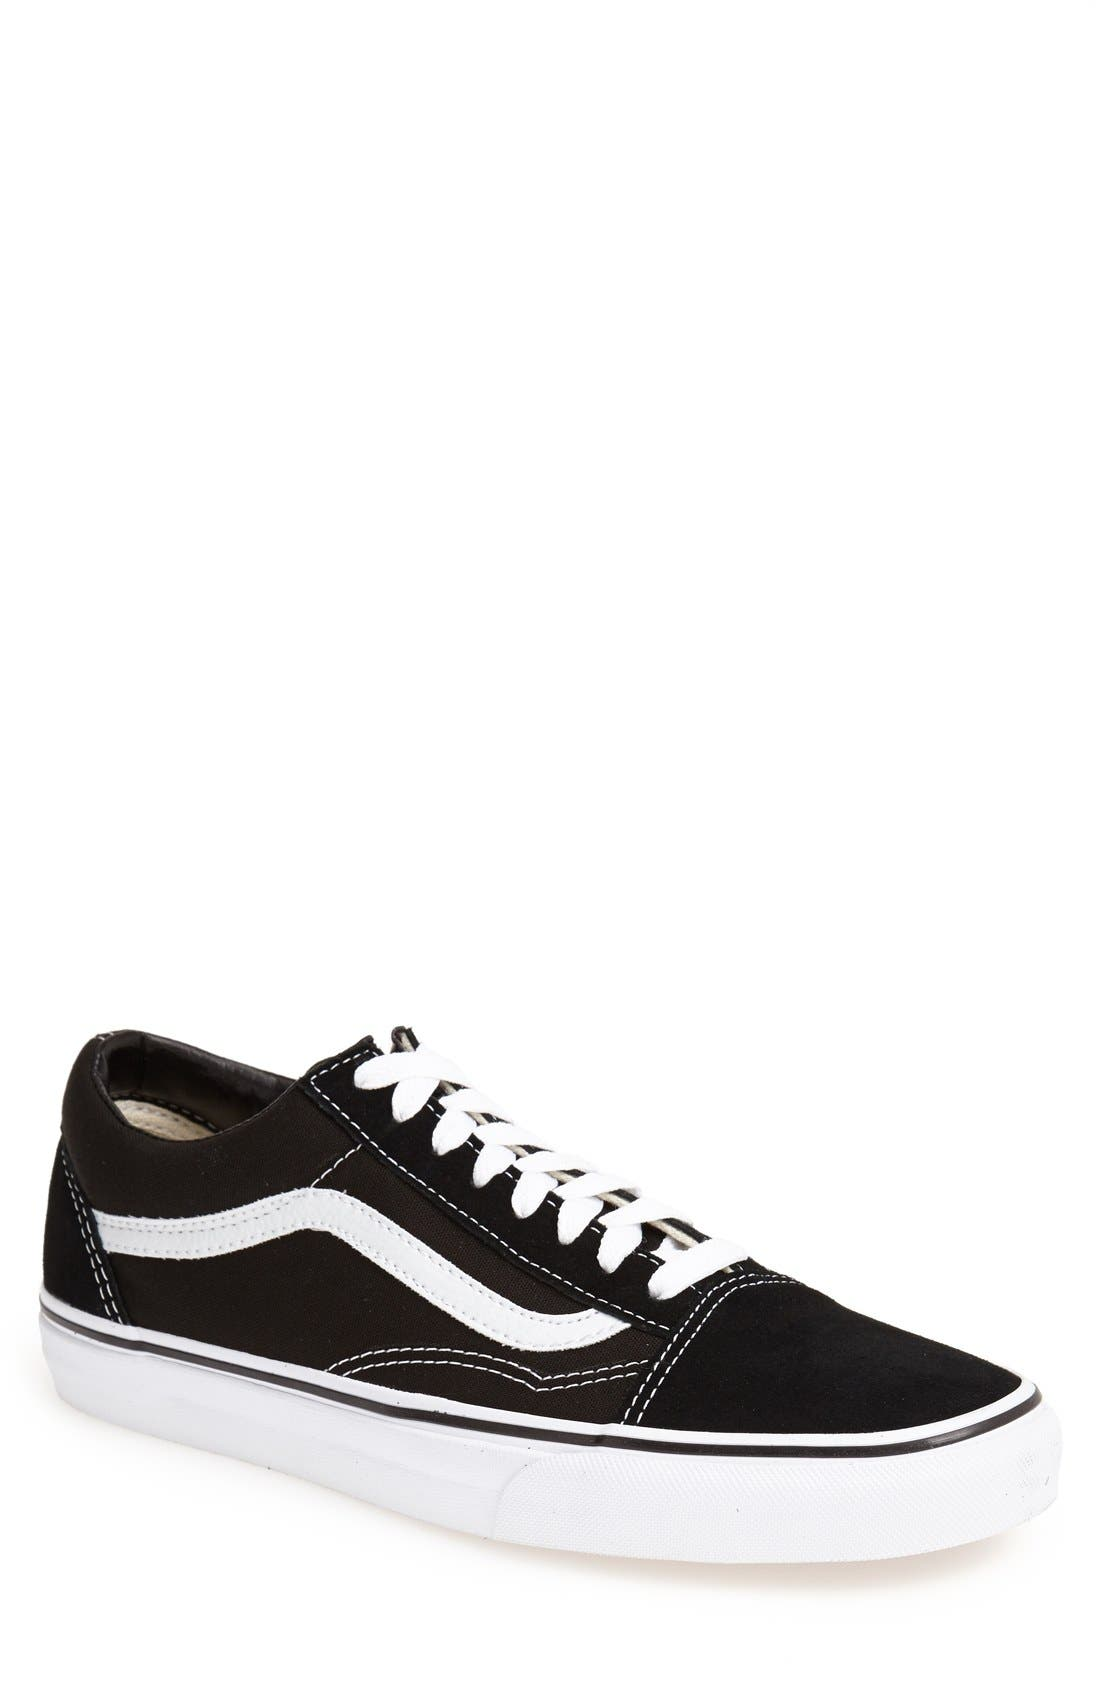 hugo boss shoes 44130 county of riverside